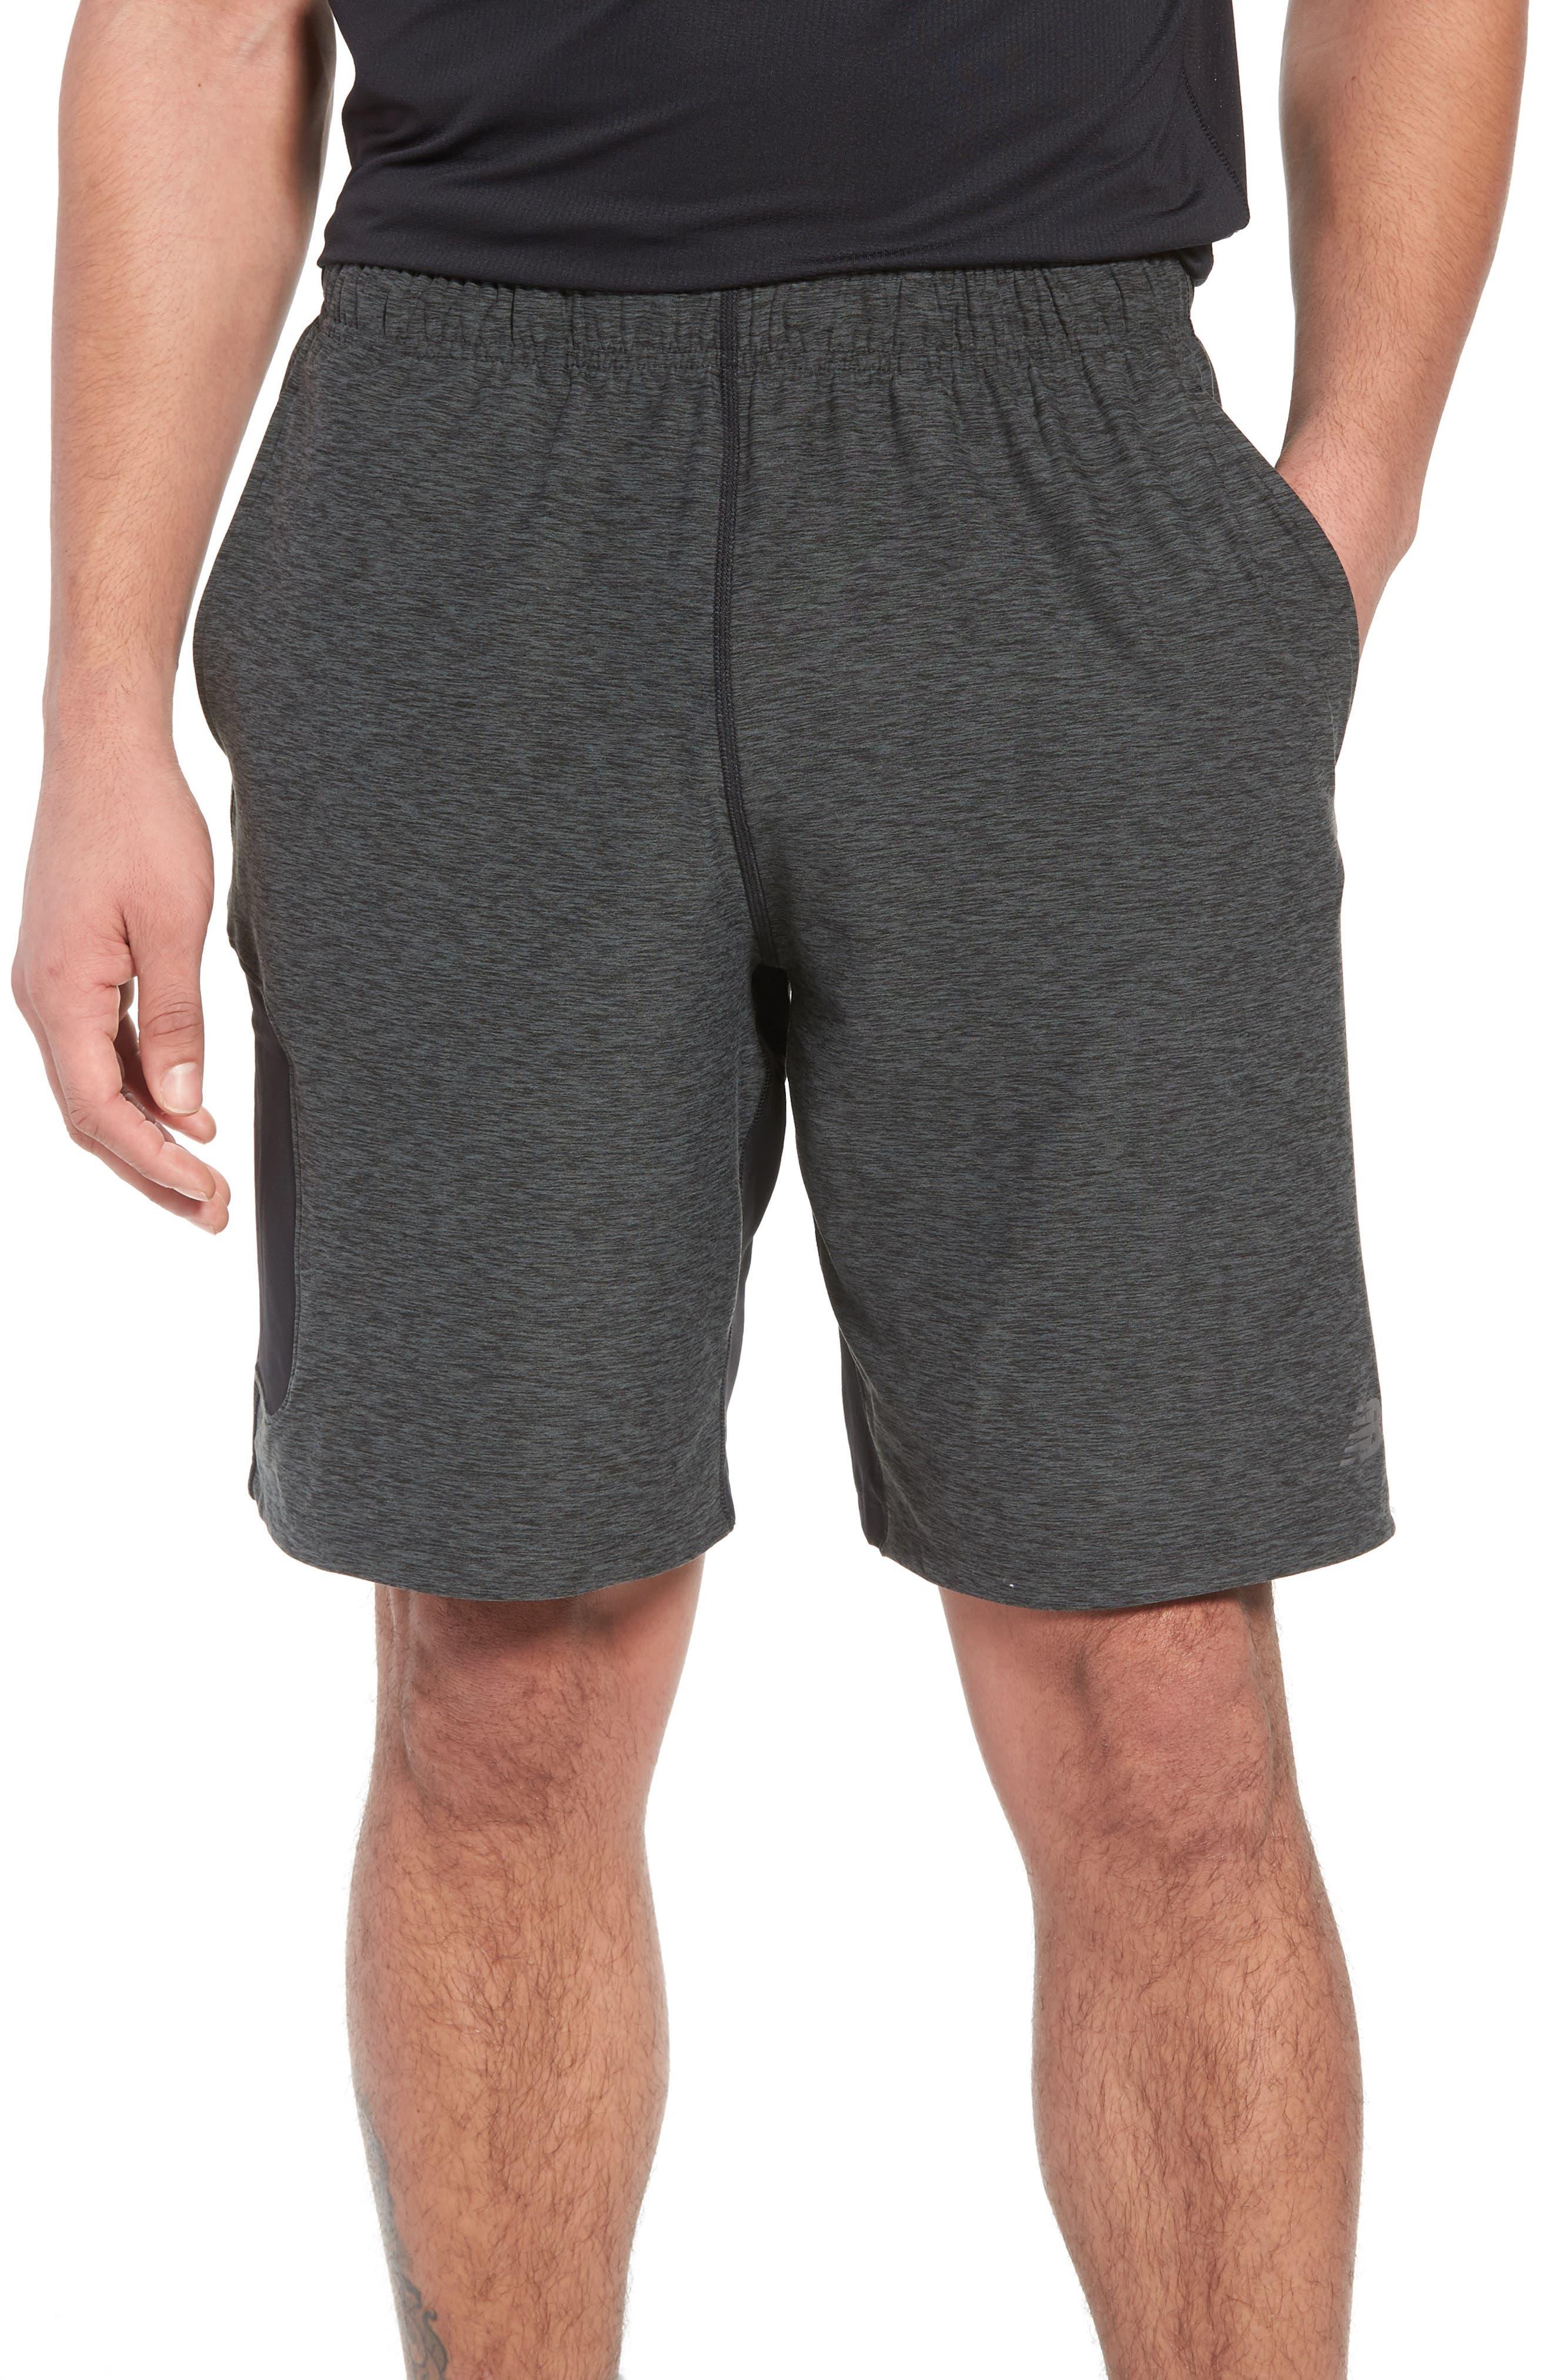 New Balance Anticipate Shorts, Grey